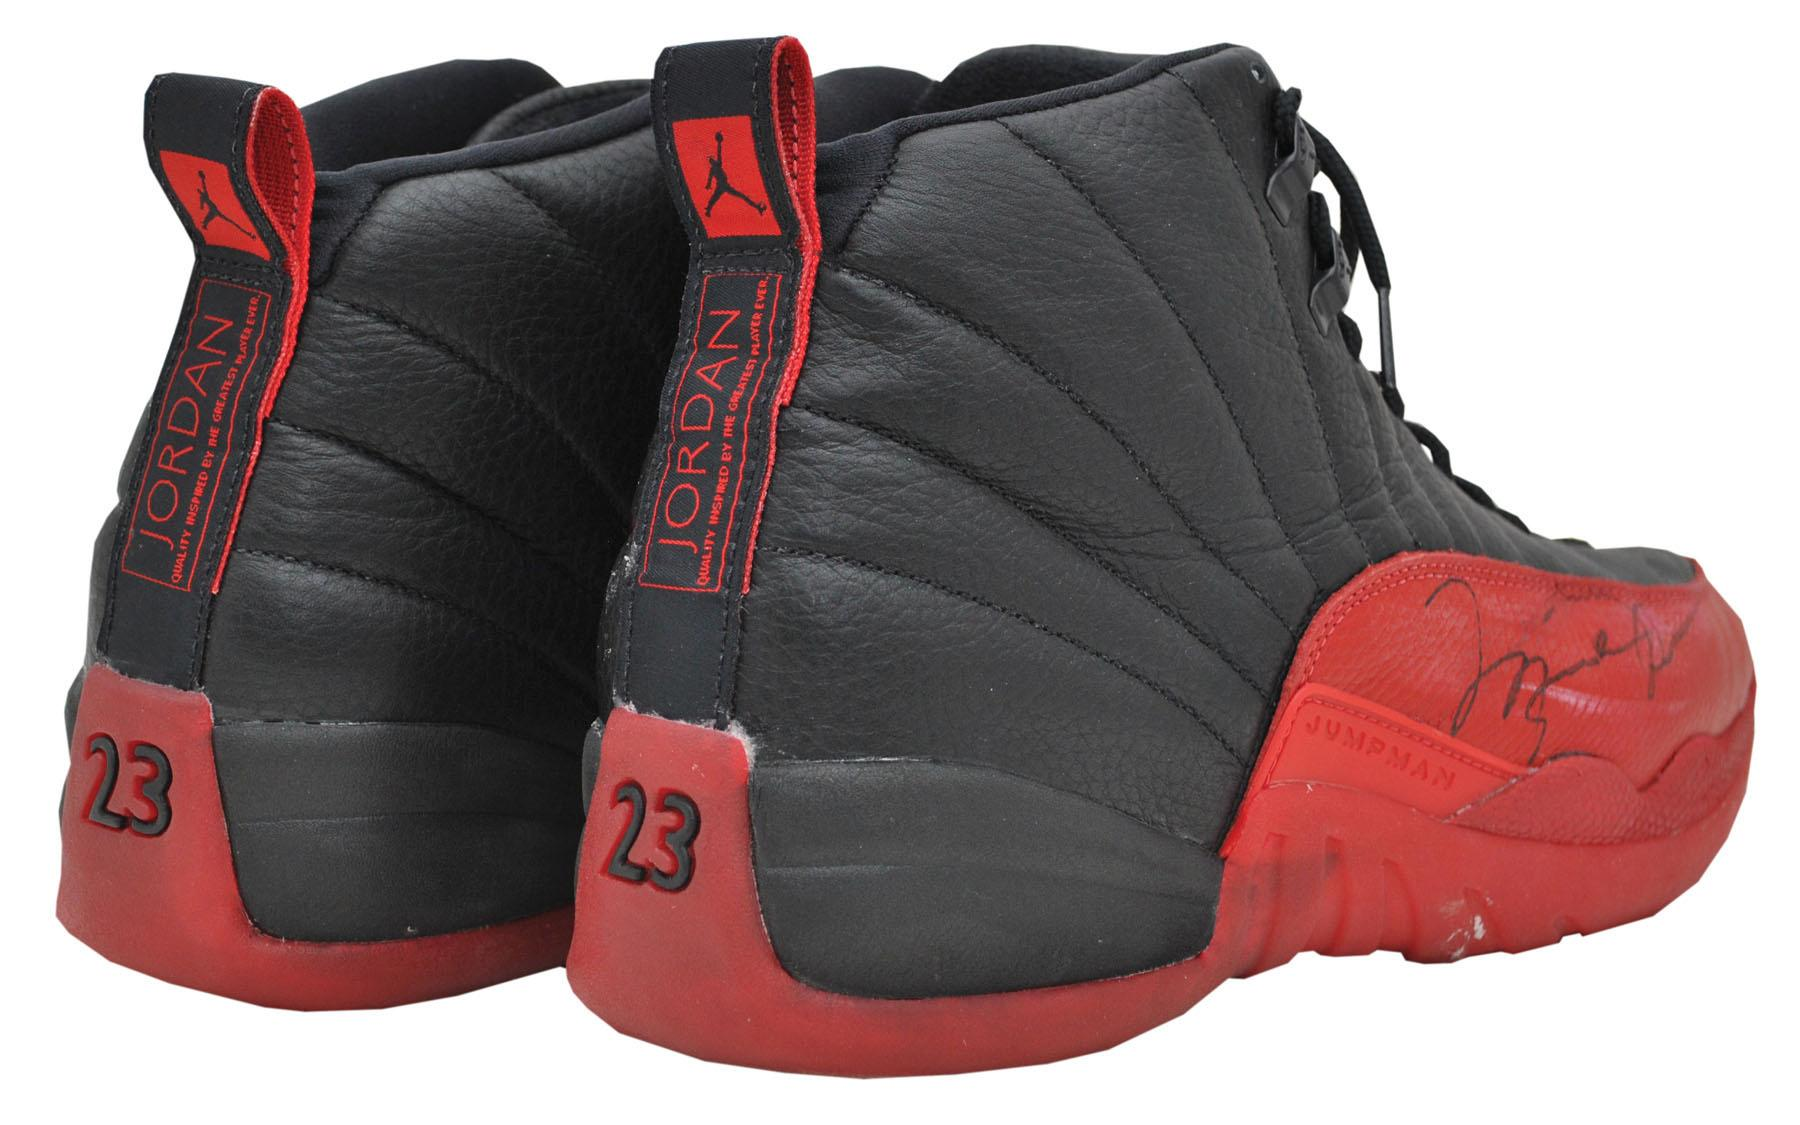 Cifra record per le scarpe di Michael Jordan - Photogallery - Rai News